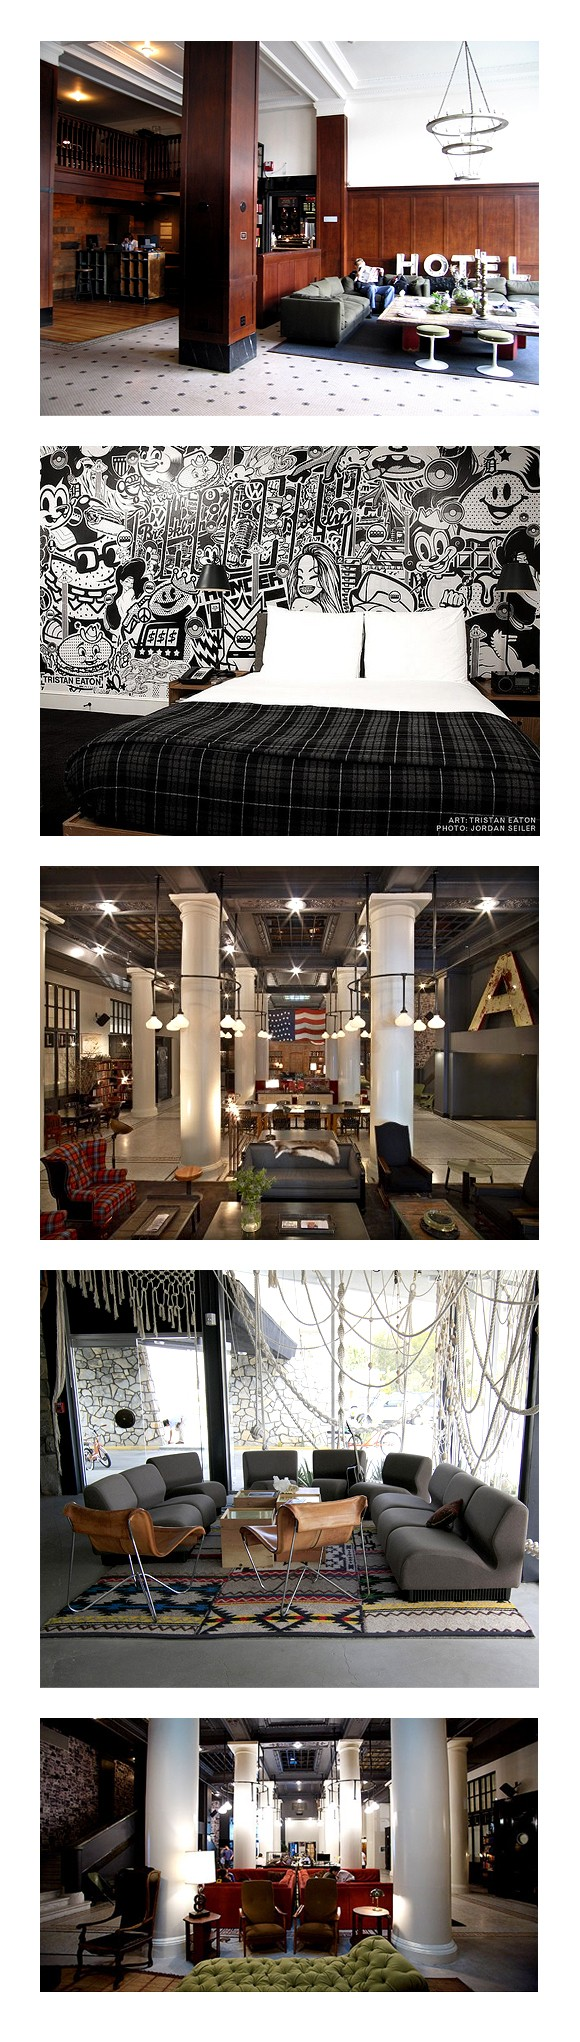 ace-hotel2